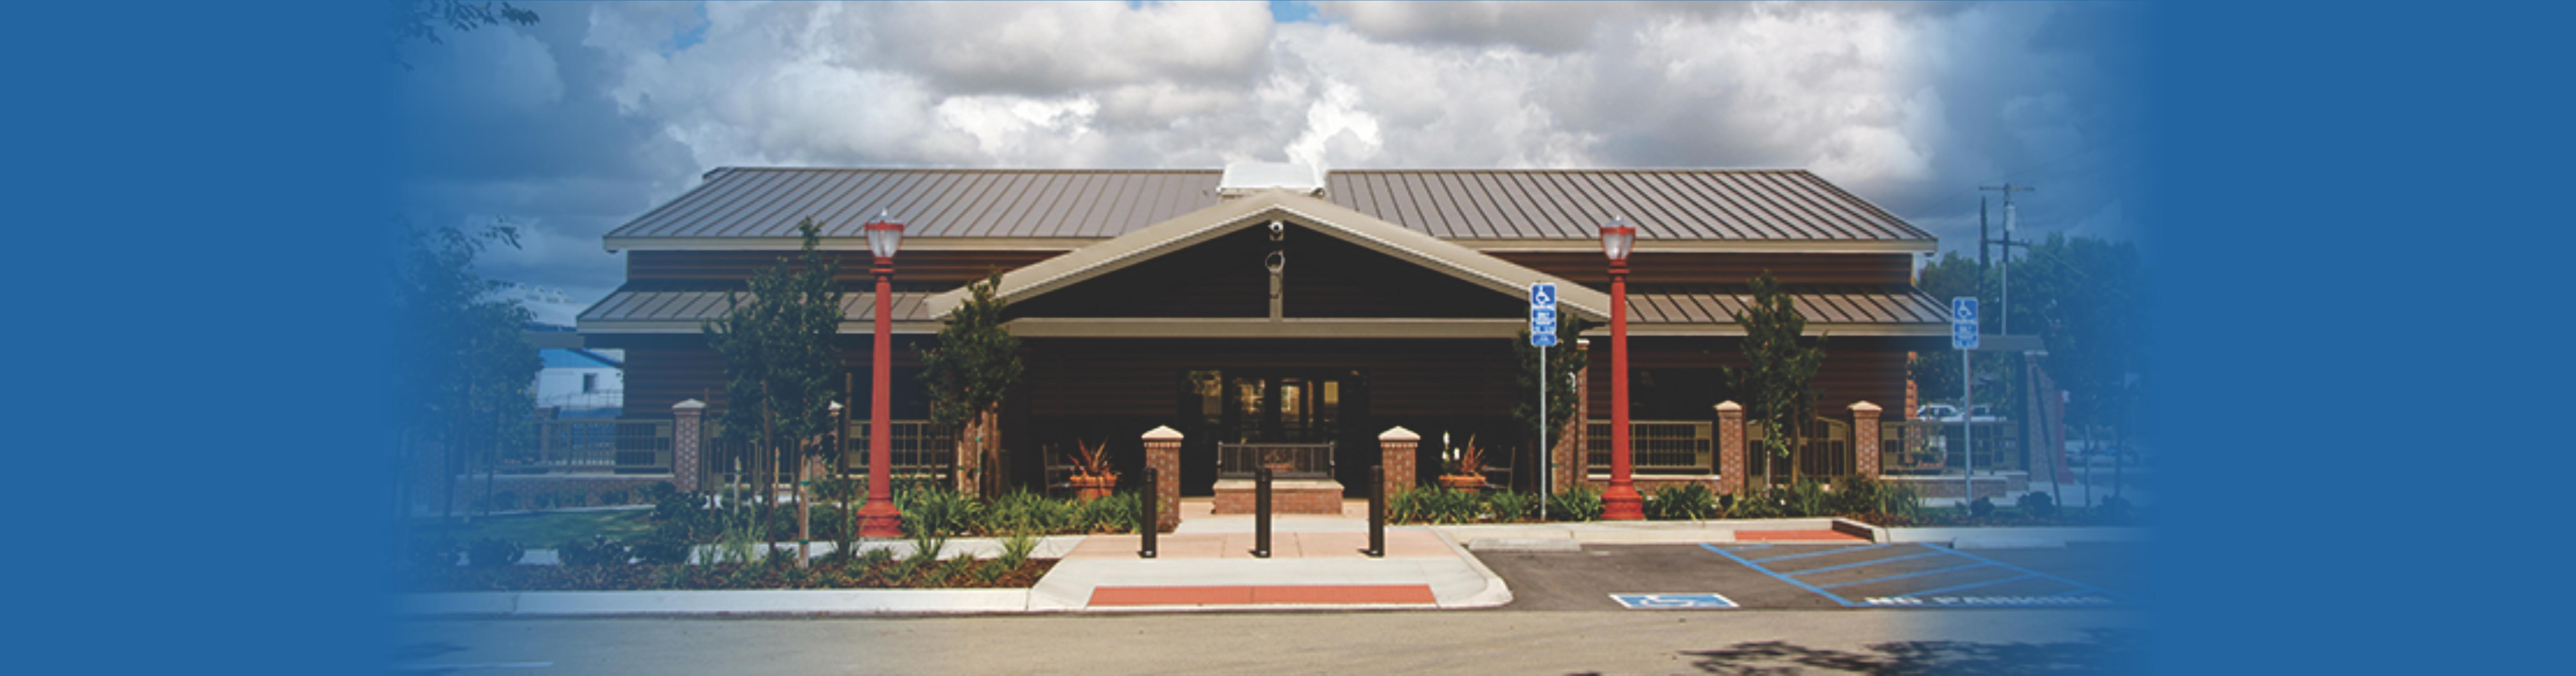 DART Transit Center